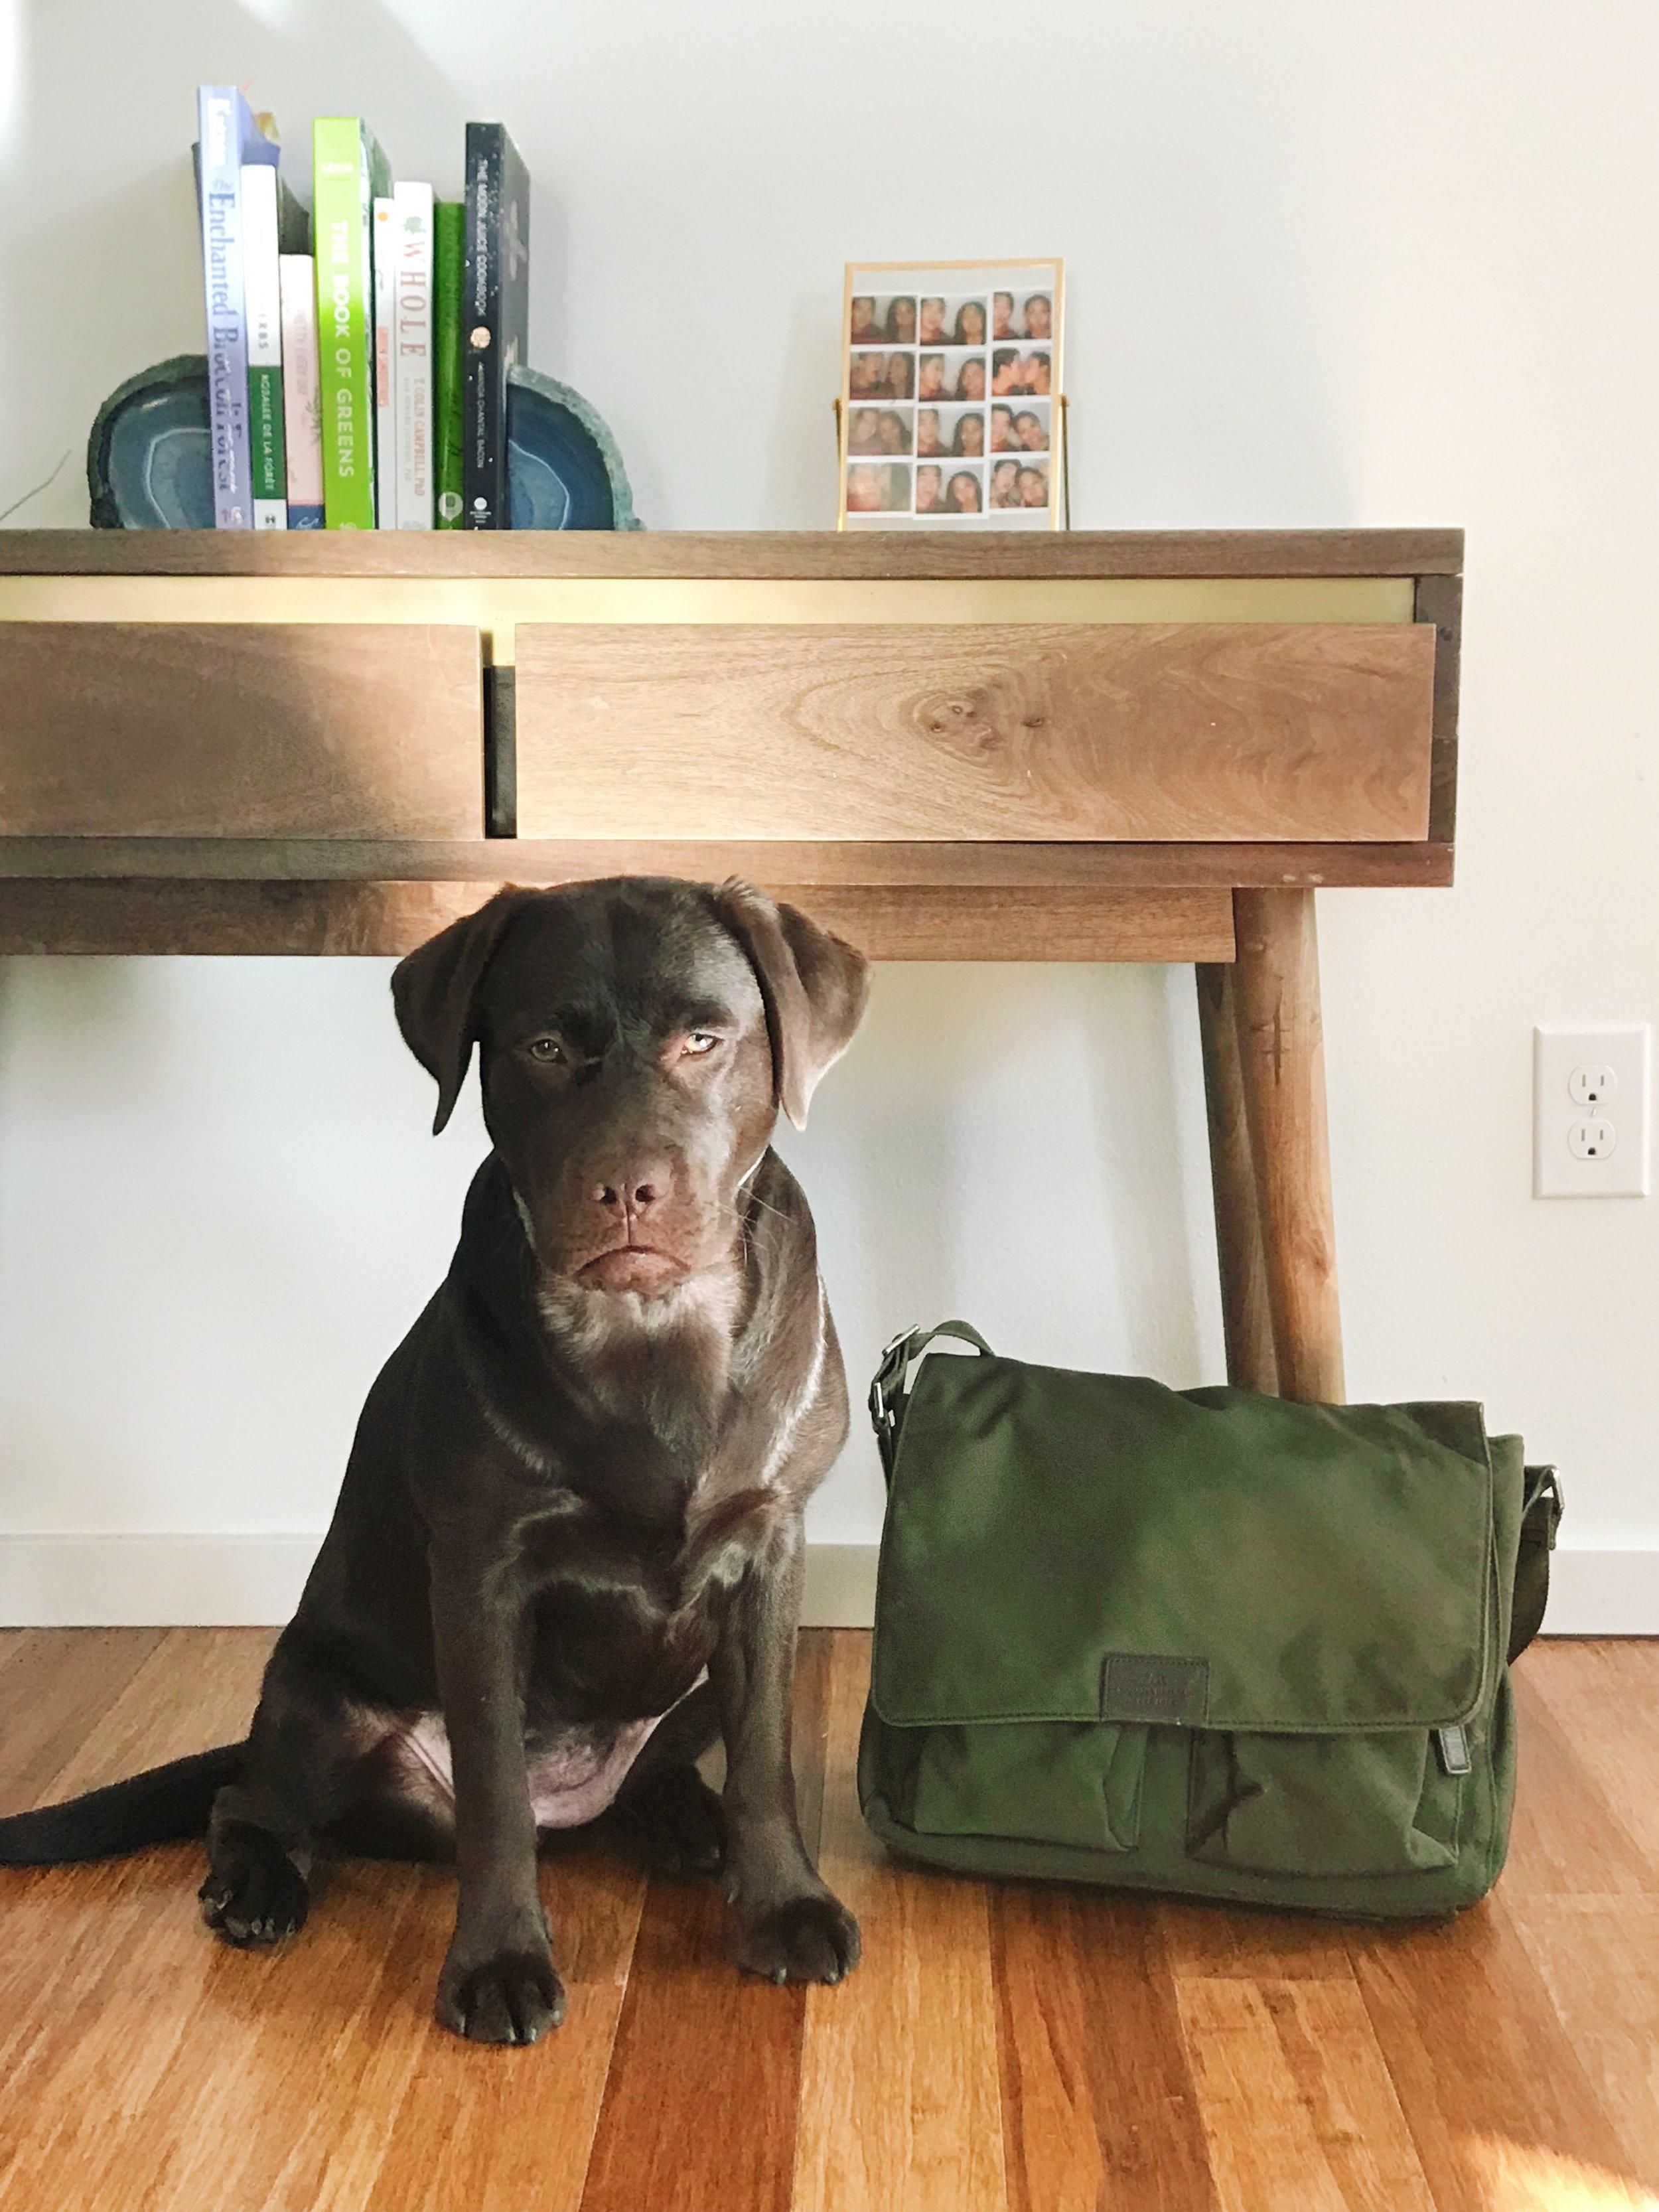 Nadine's pup, Cora